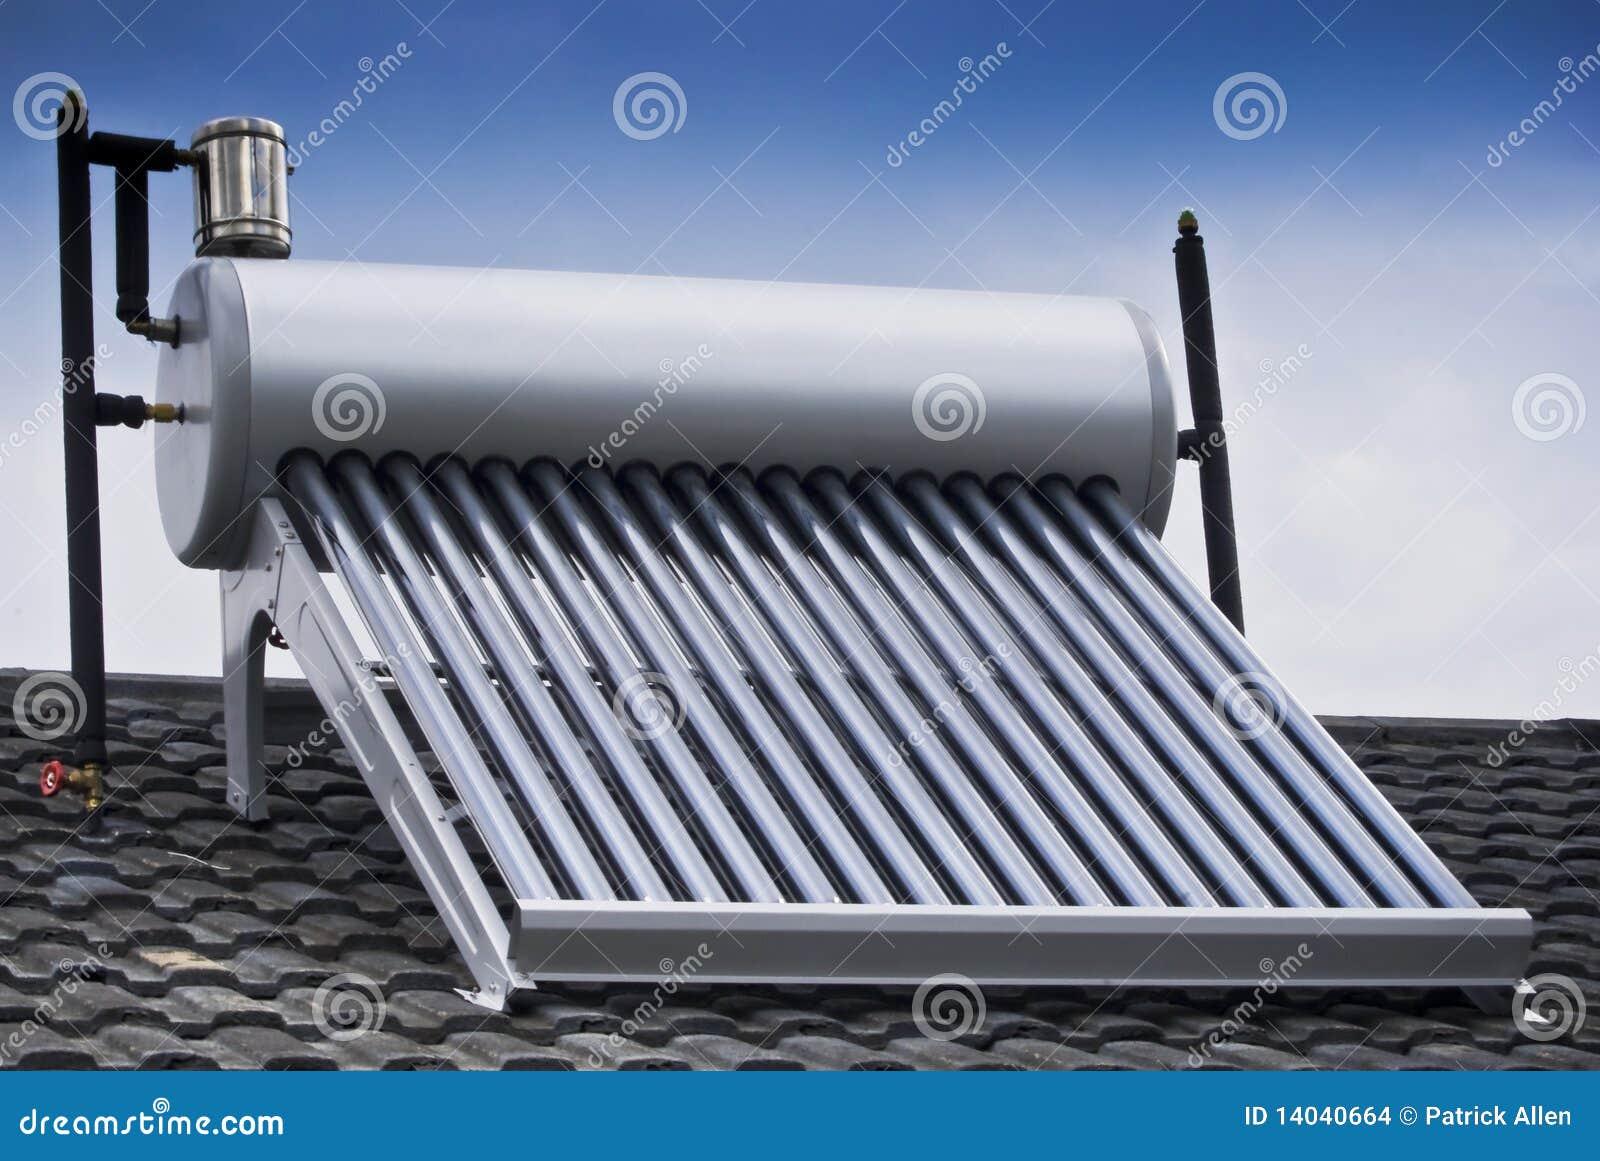 chauffe eau solaire tube